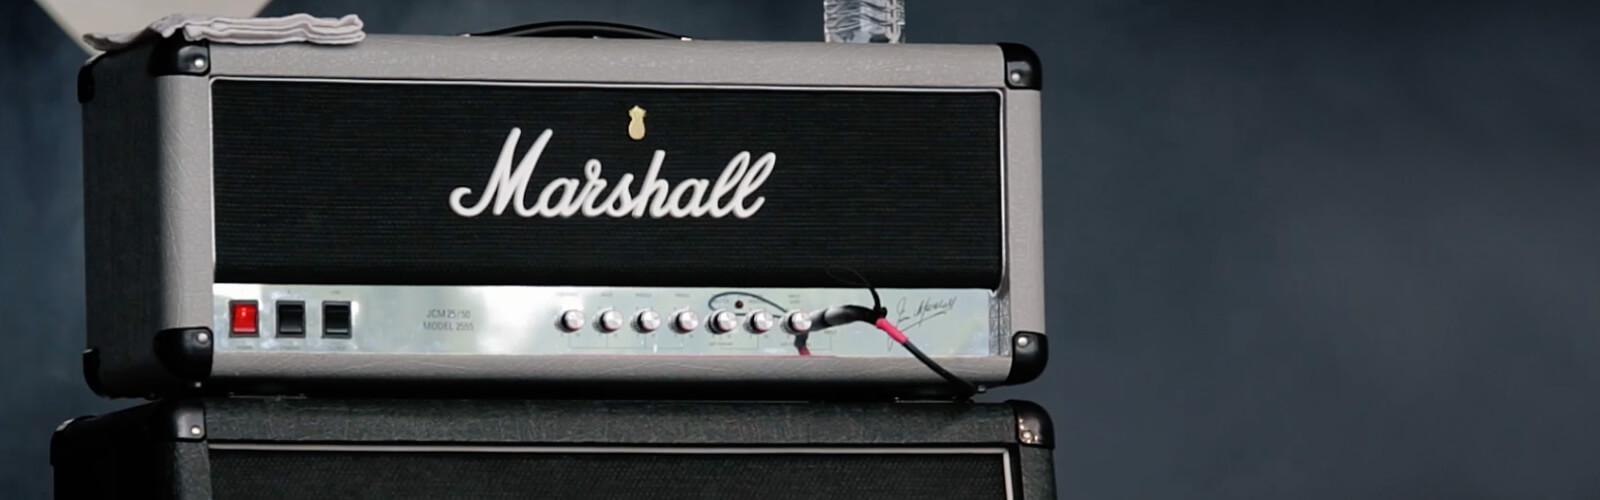 Marshall amplifier head